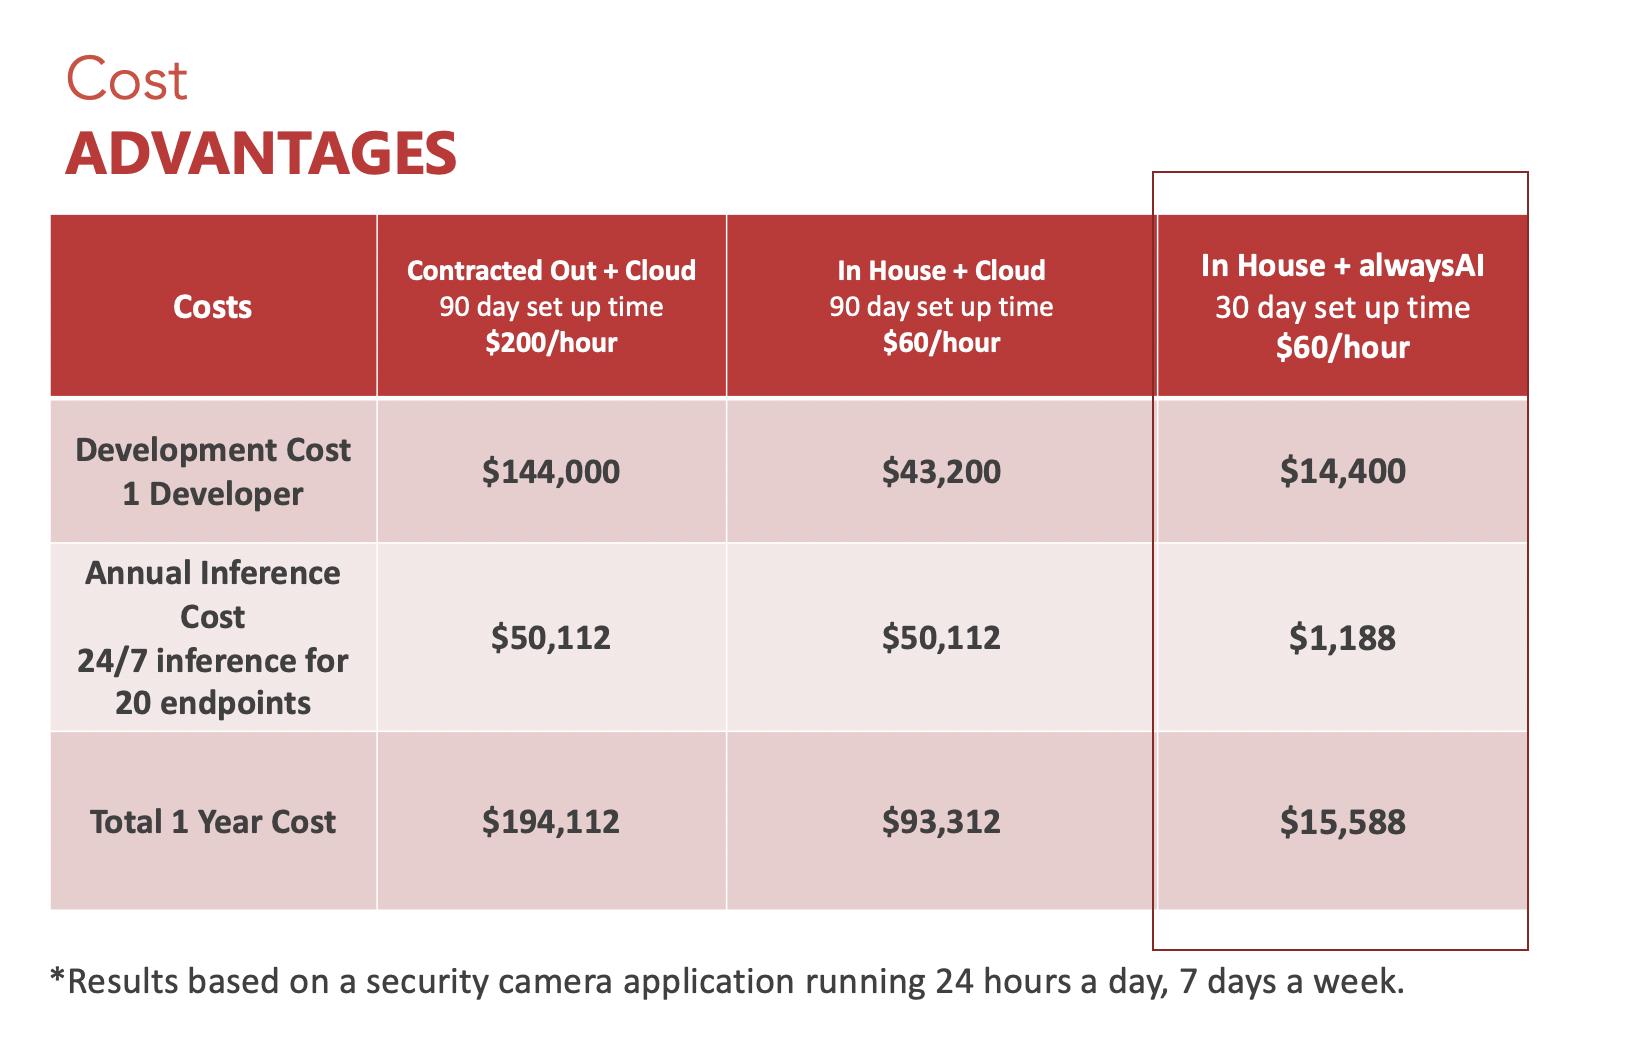 ScreenShot cost advantages of Computer Vision